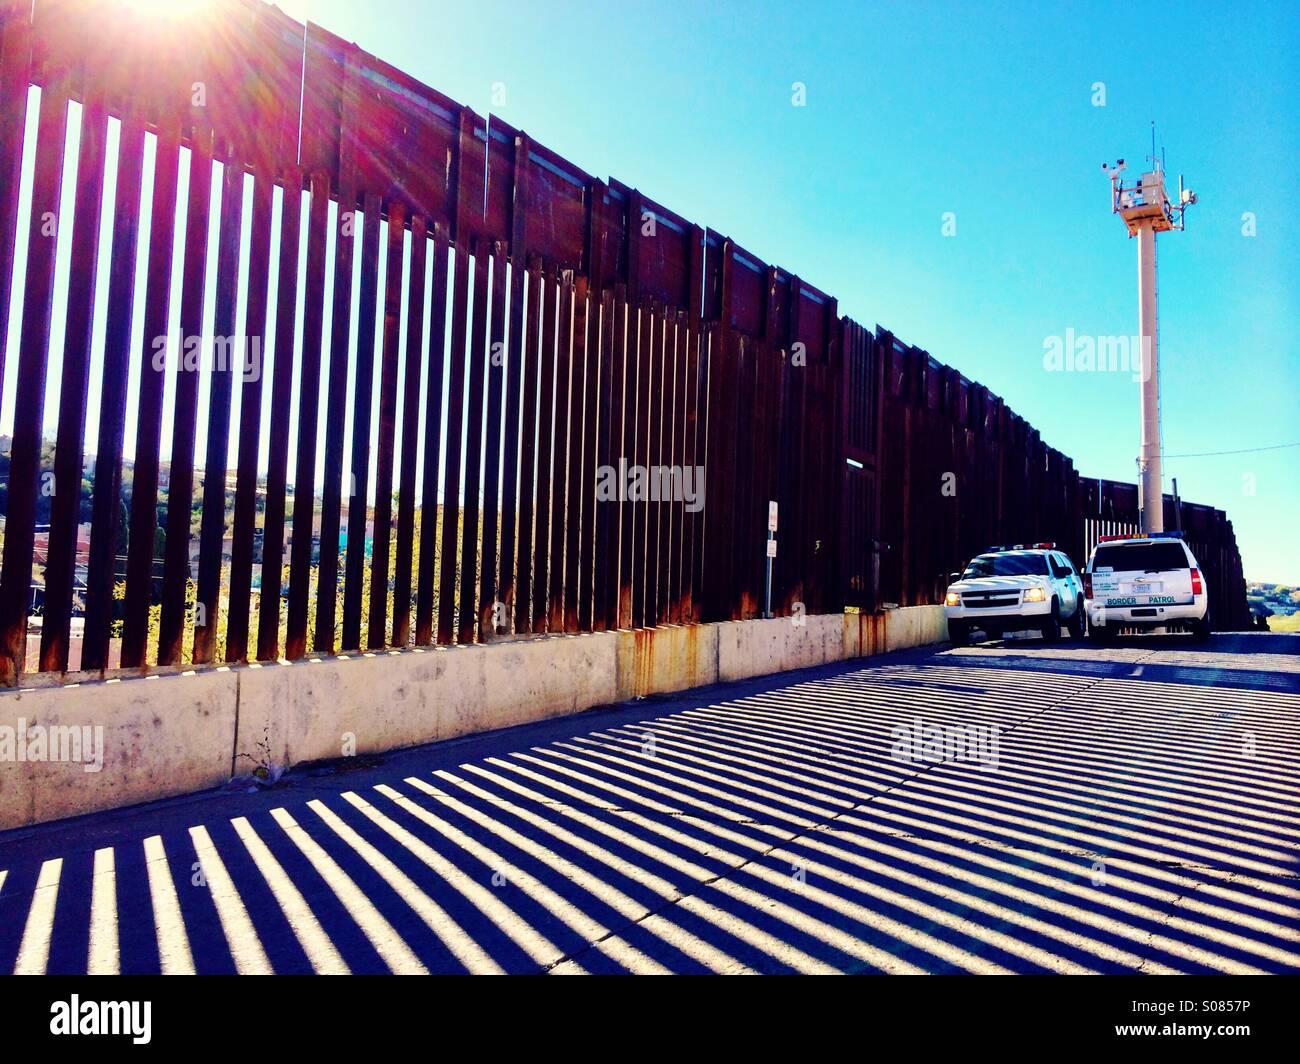 Border Patrol - Stock Image